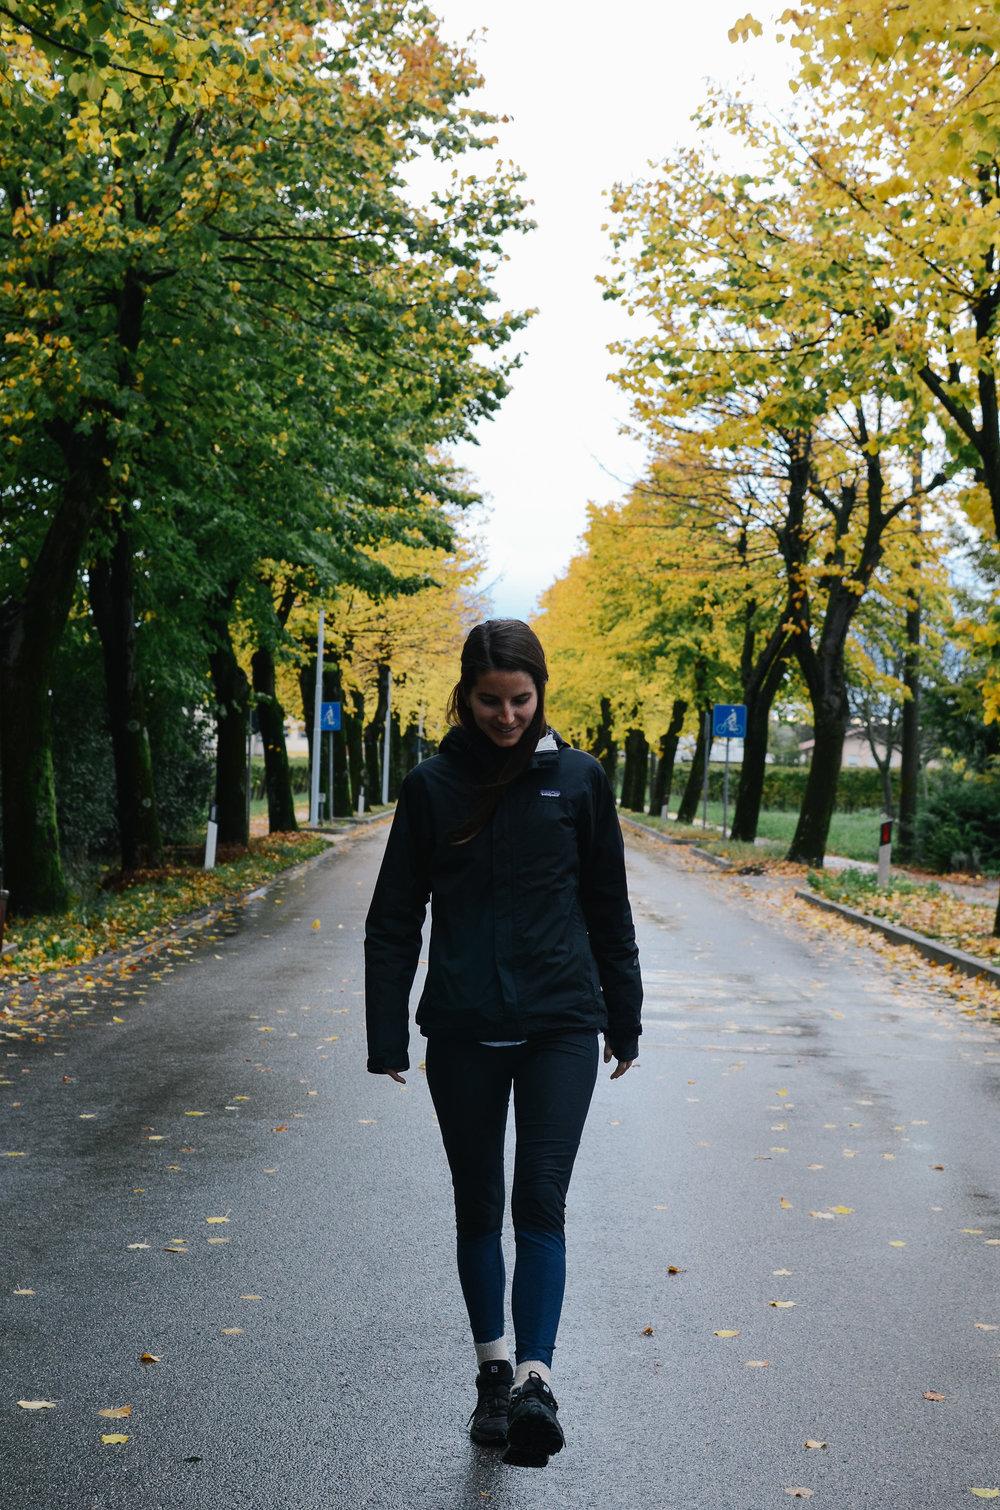 day-trips-western-slovenia-lifeonpine_DSC_0790.jpg